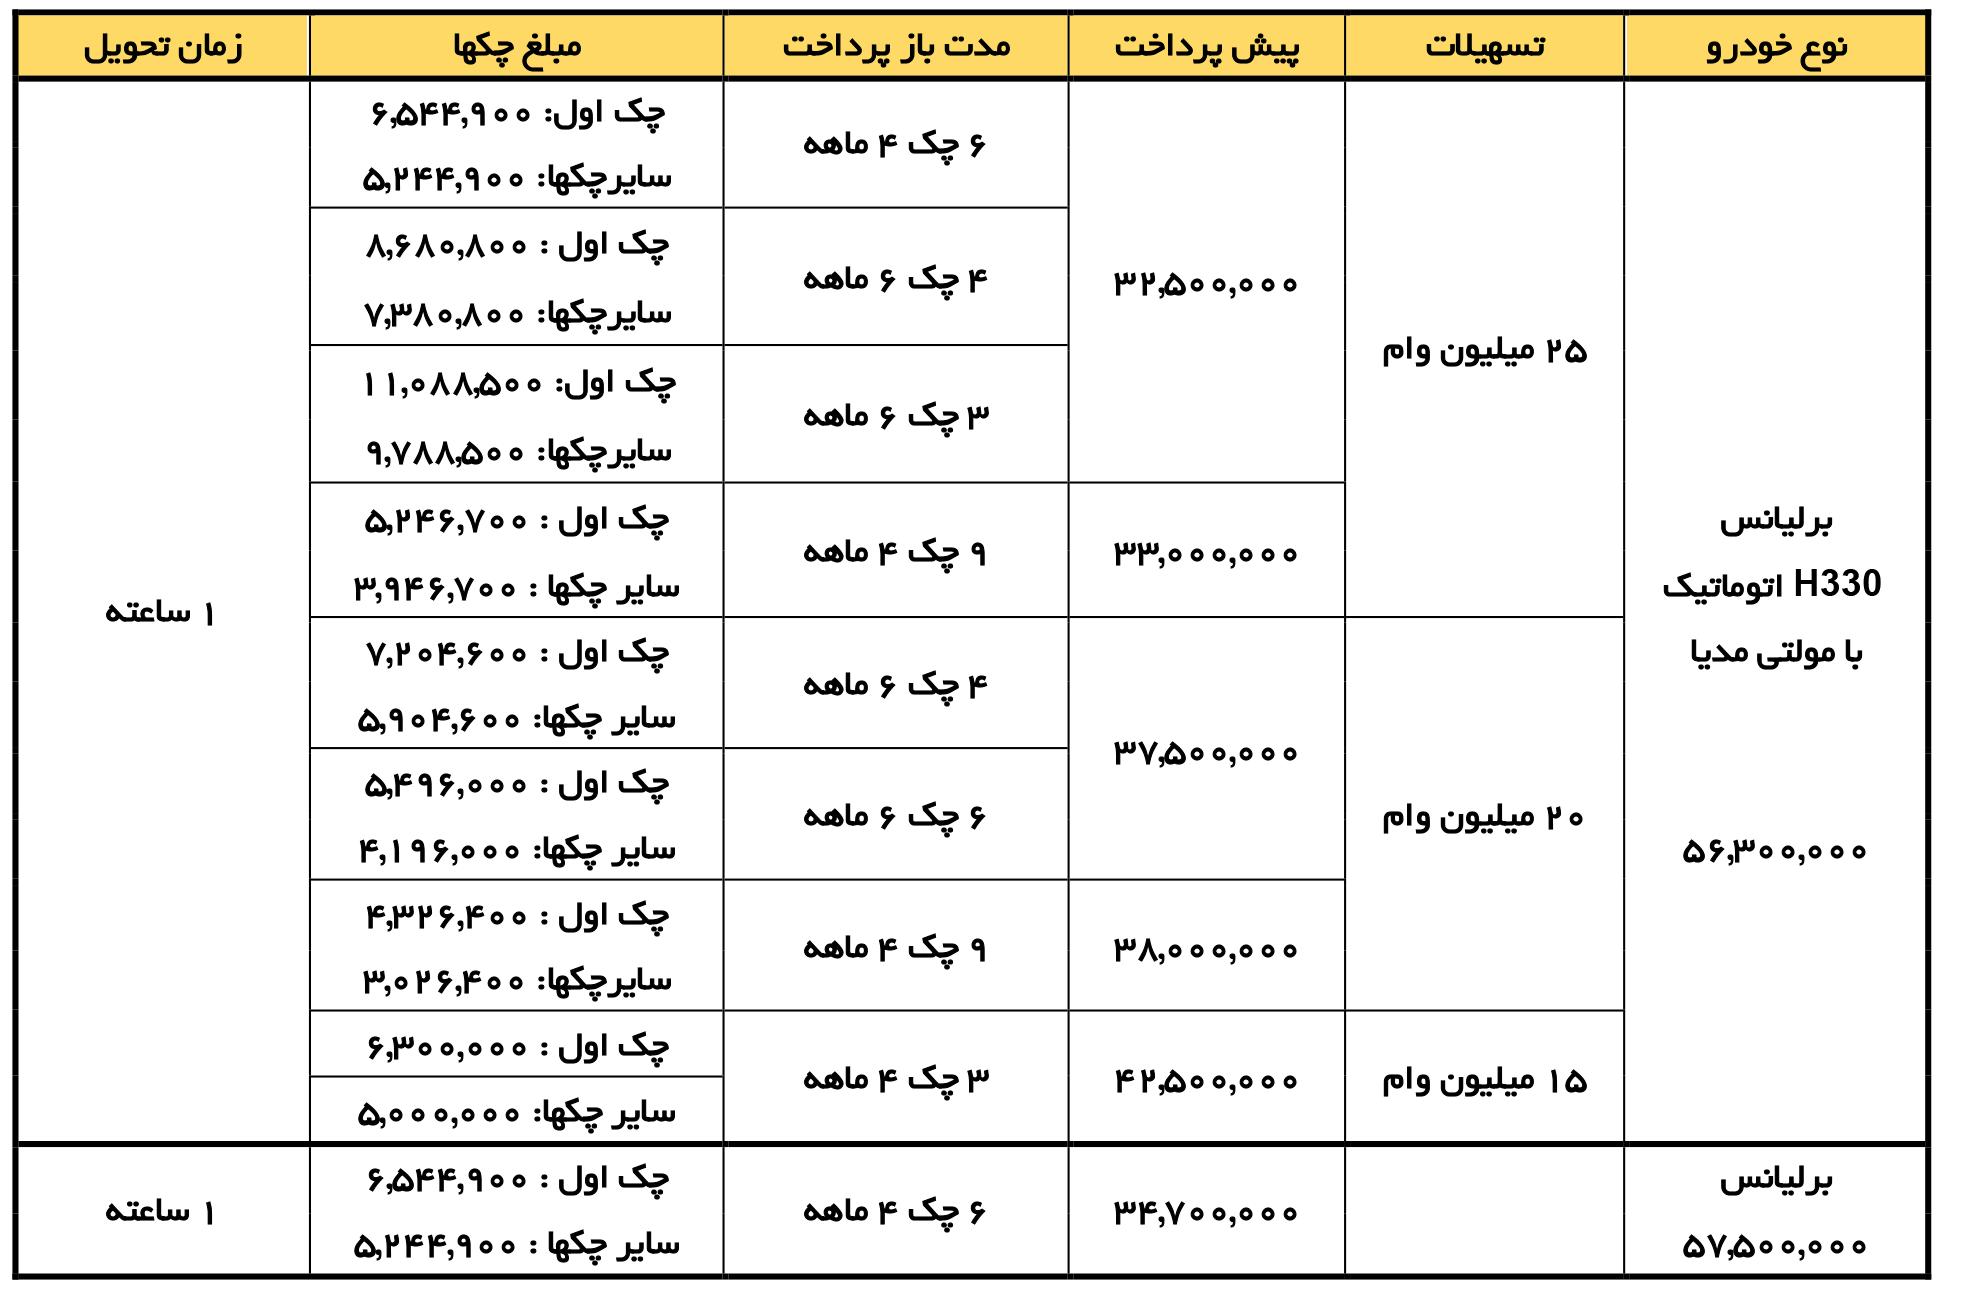 جدول فروش برلیانس